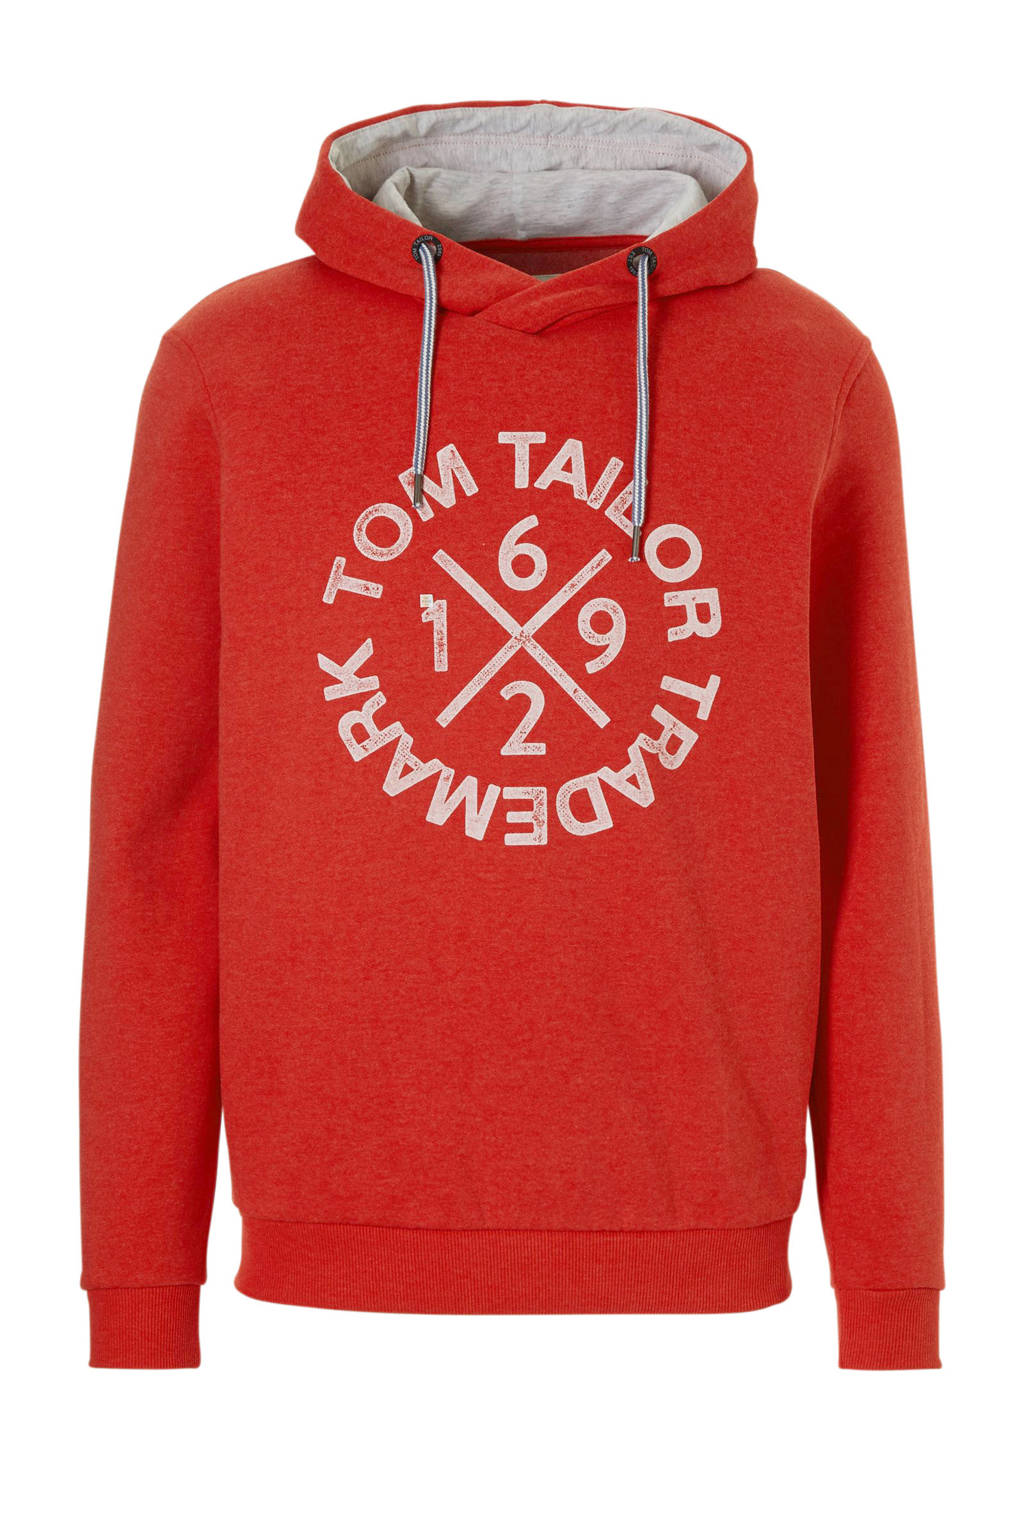 Tom Tailor hoodie, Rood